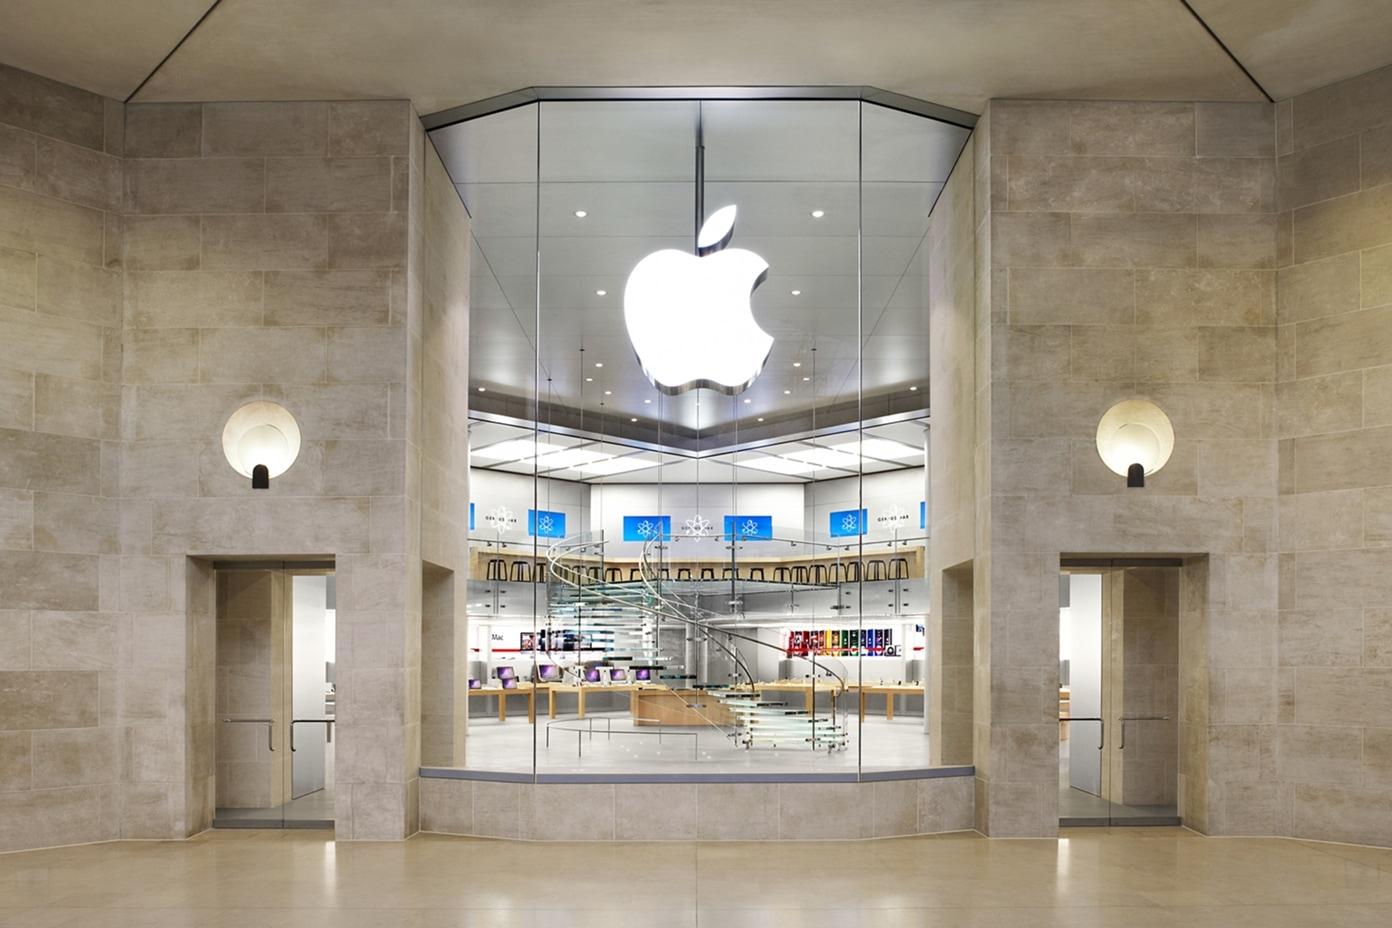 Apple Carrousel Du Louvre